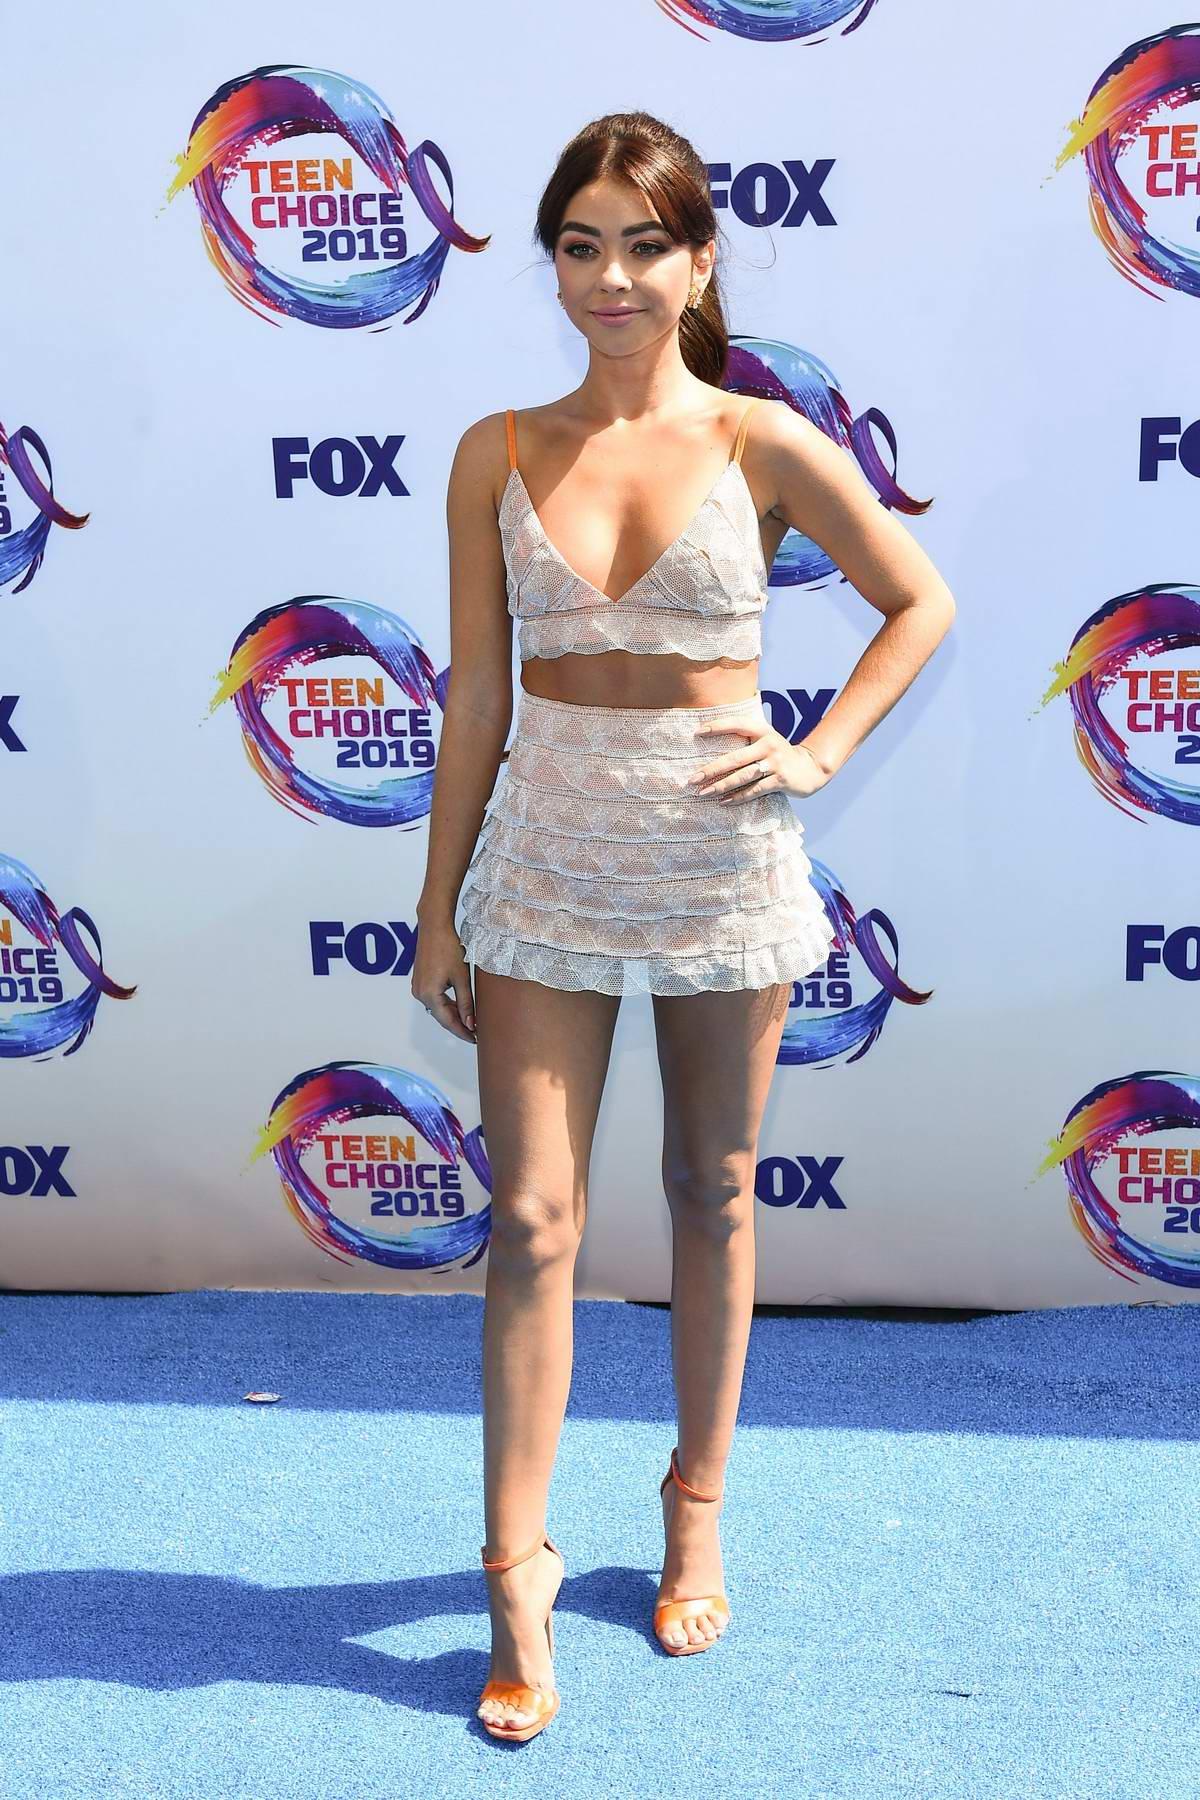 Sarah Hyland attends the FOX's Teen Choice Awards 2019 in Hermosa Beach, California